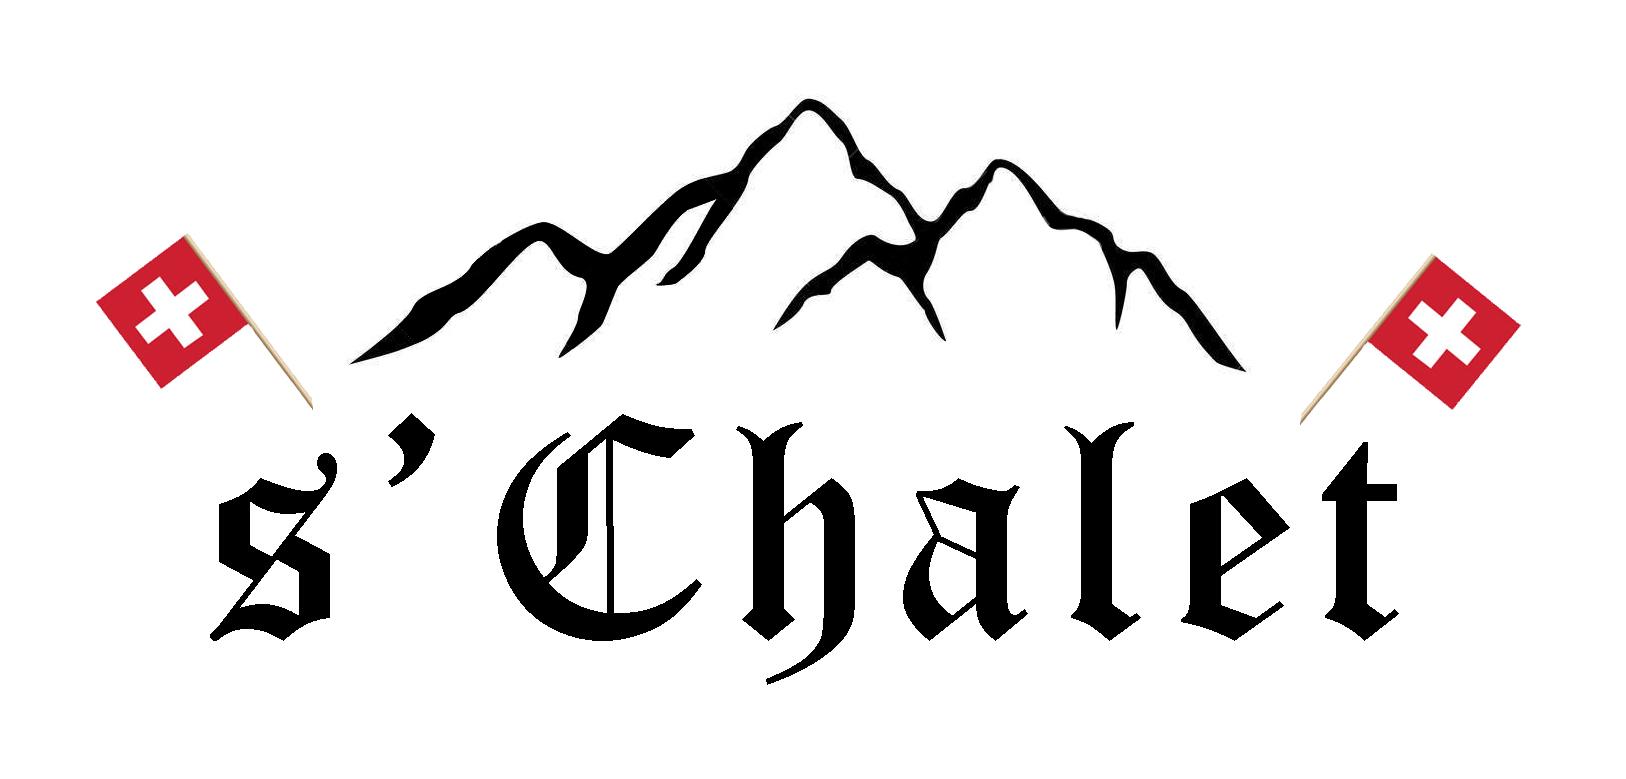 8 S'Chalet: Puurezmorge, Dällikerli mit Härdöpfelsalat